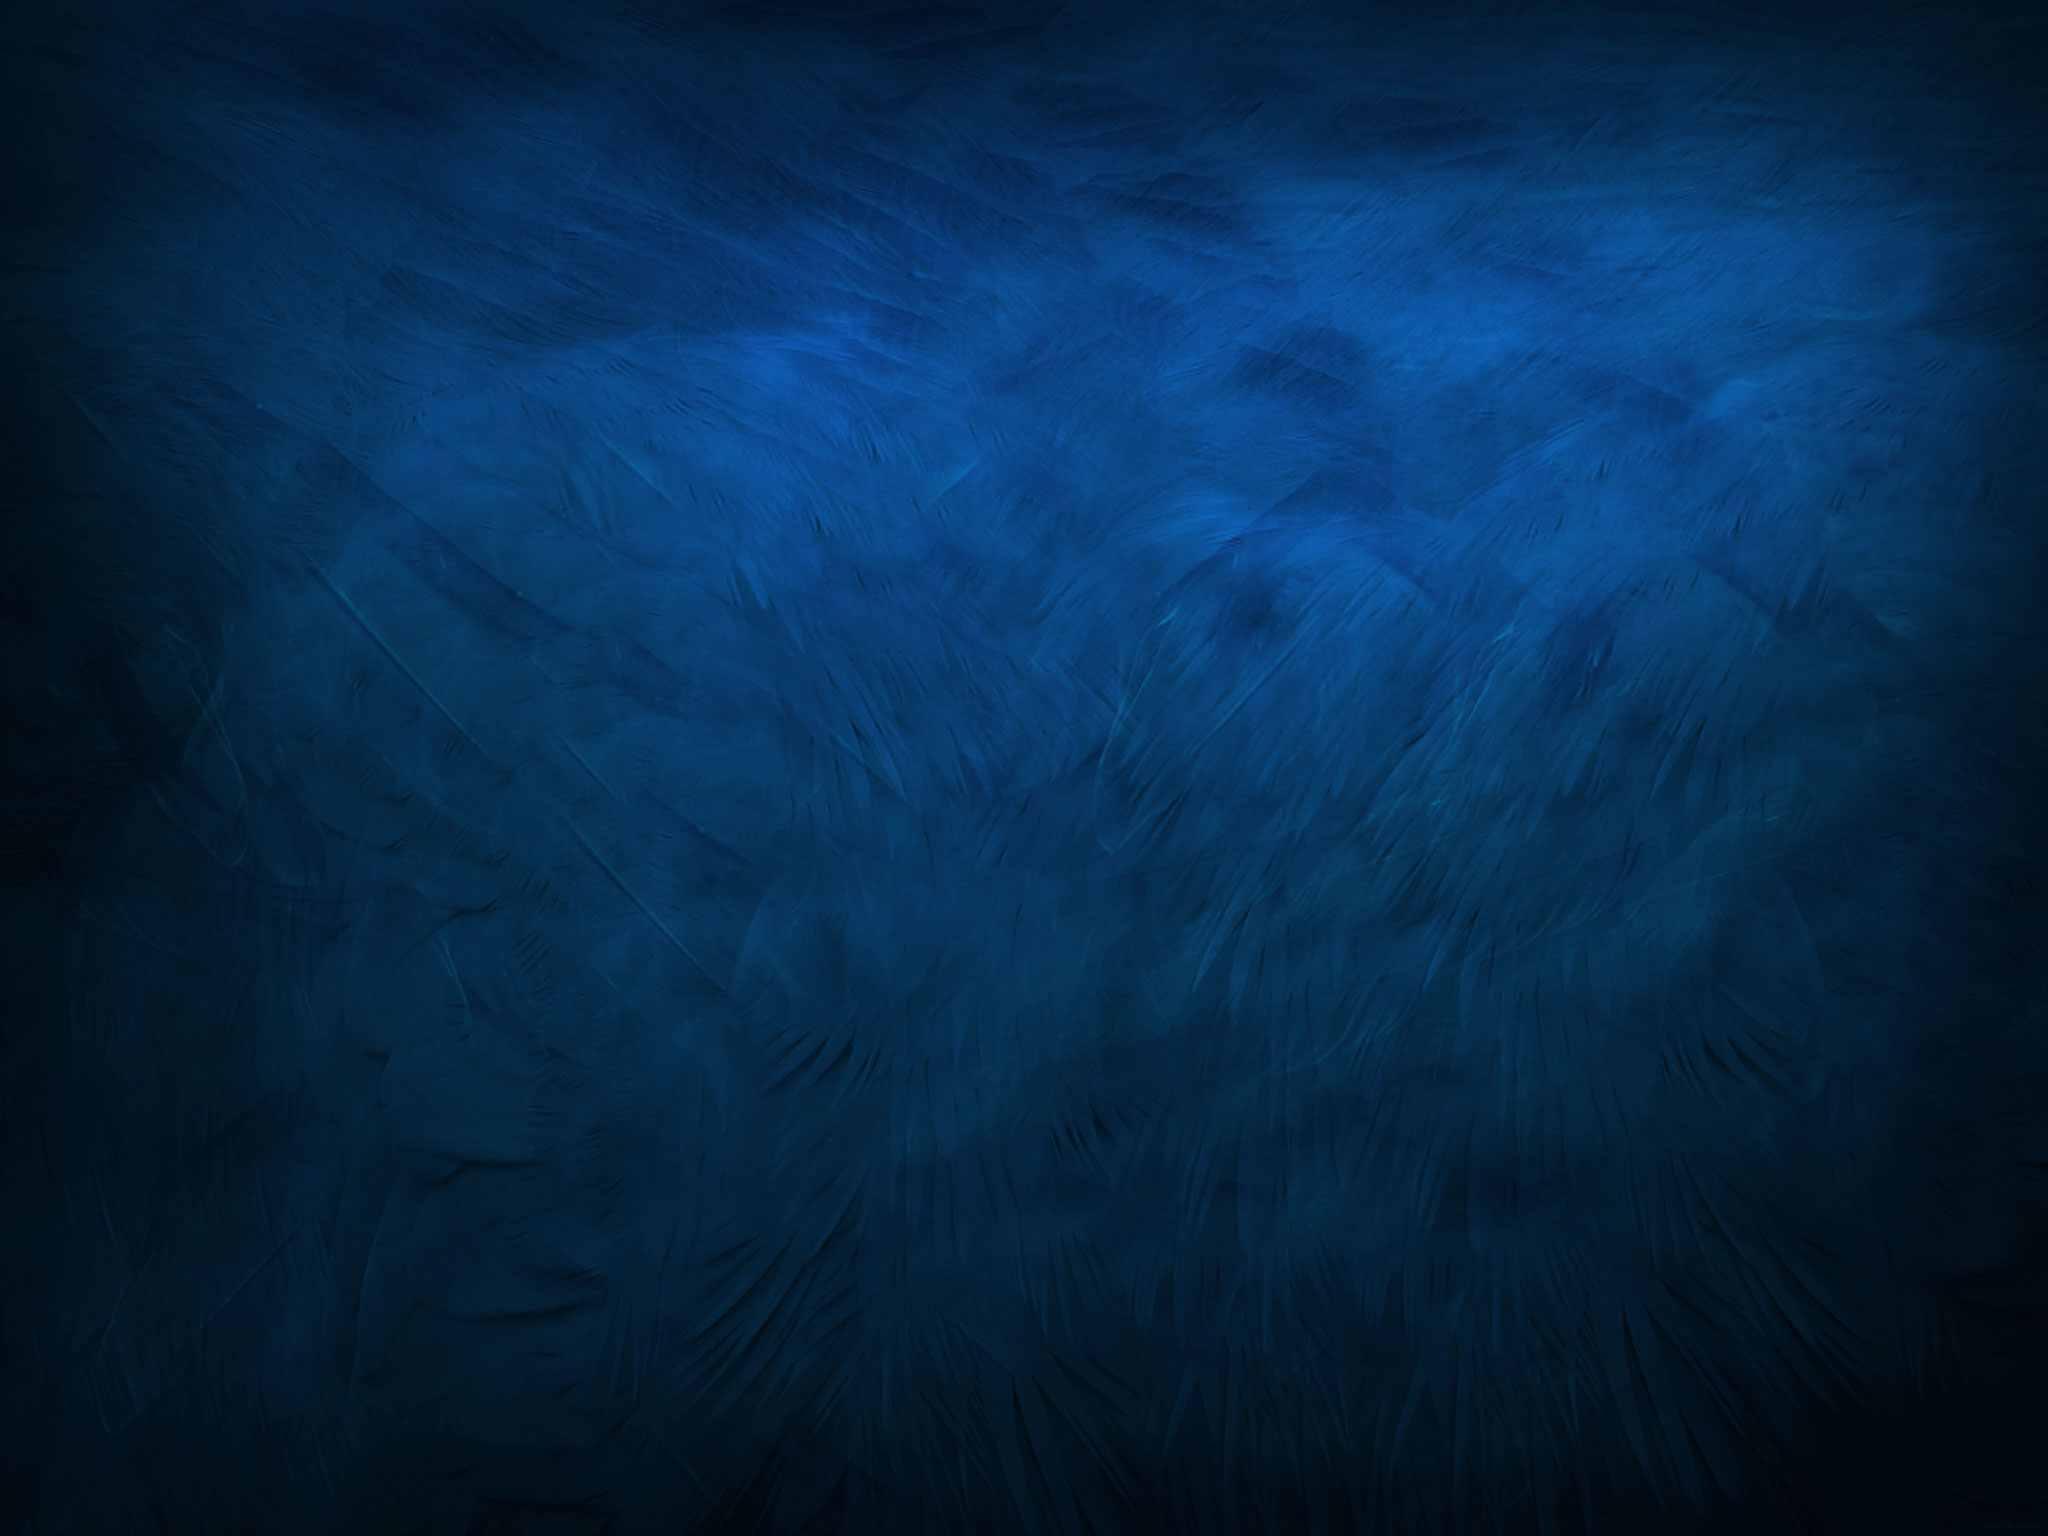 Navy Blue Background Stock Images RoyaltyFree Images